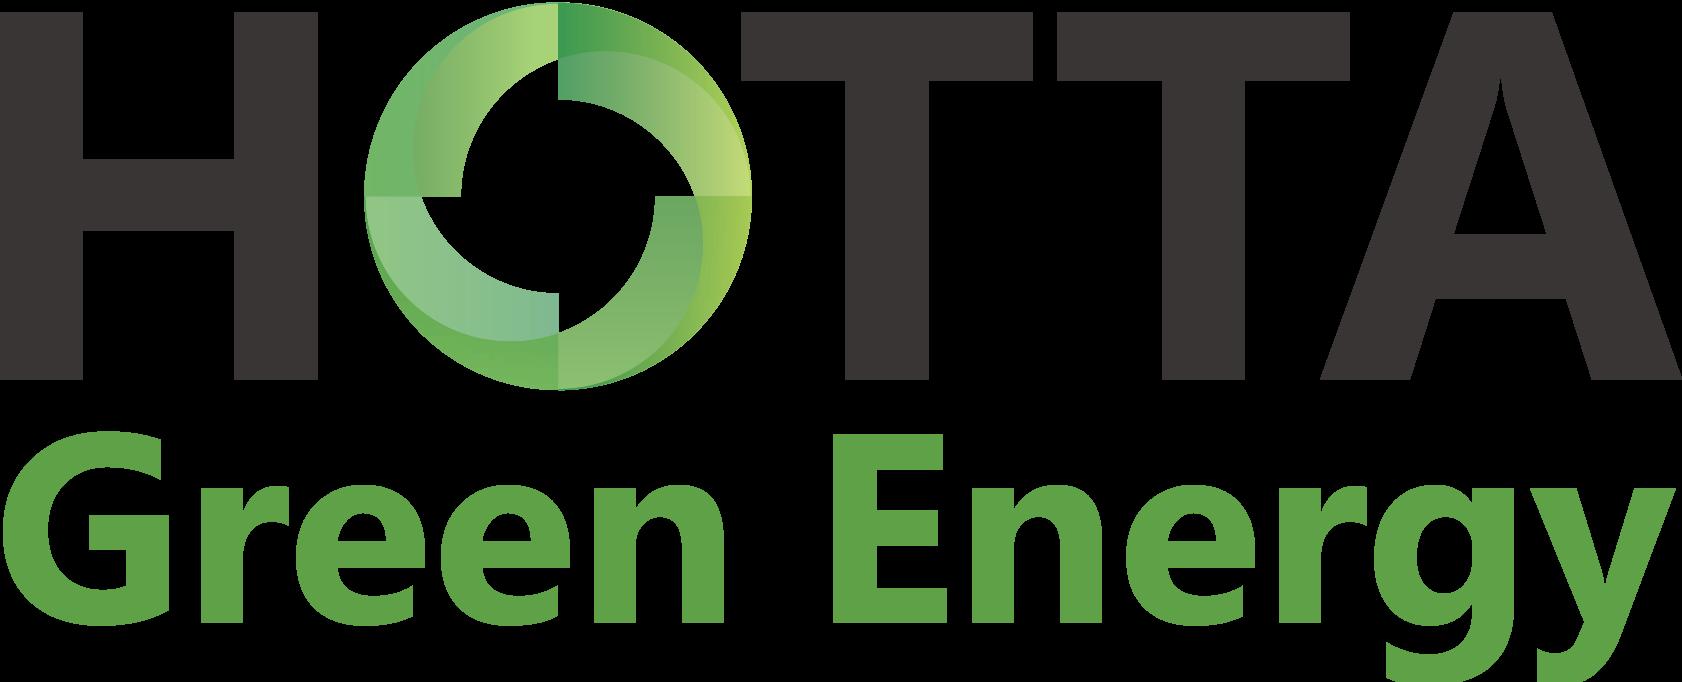 Hotta Green Energy